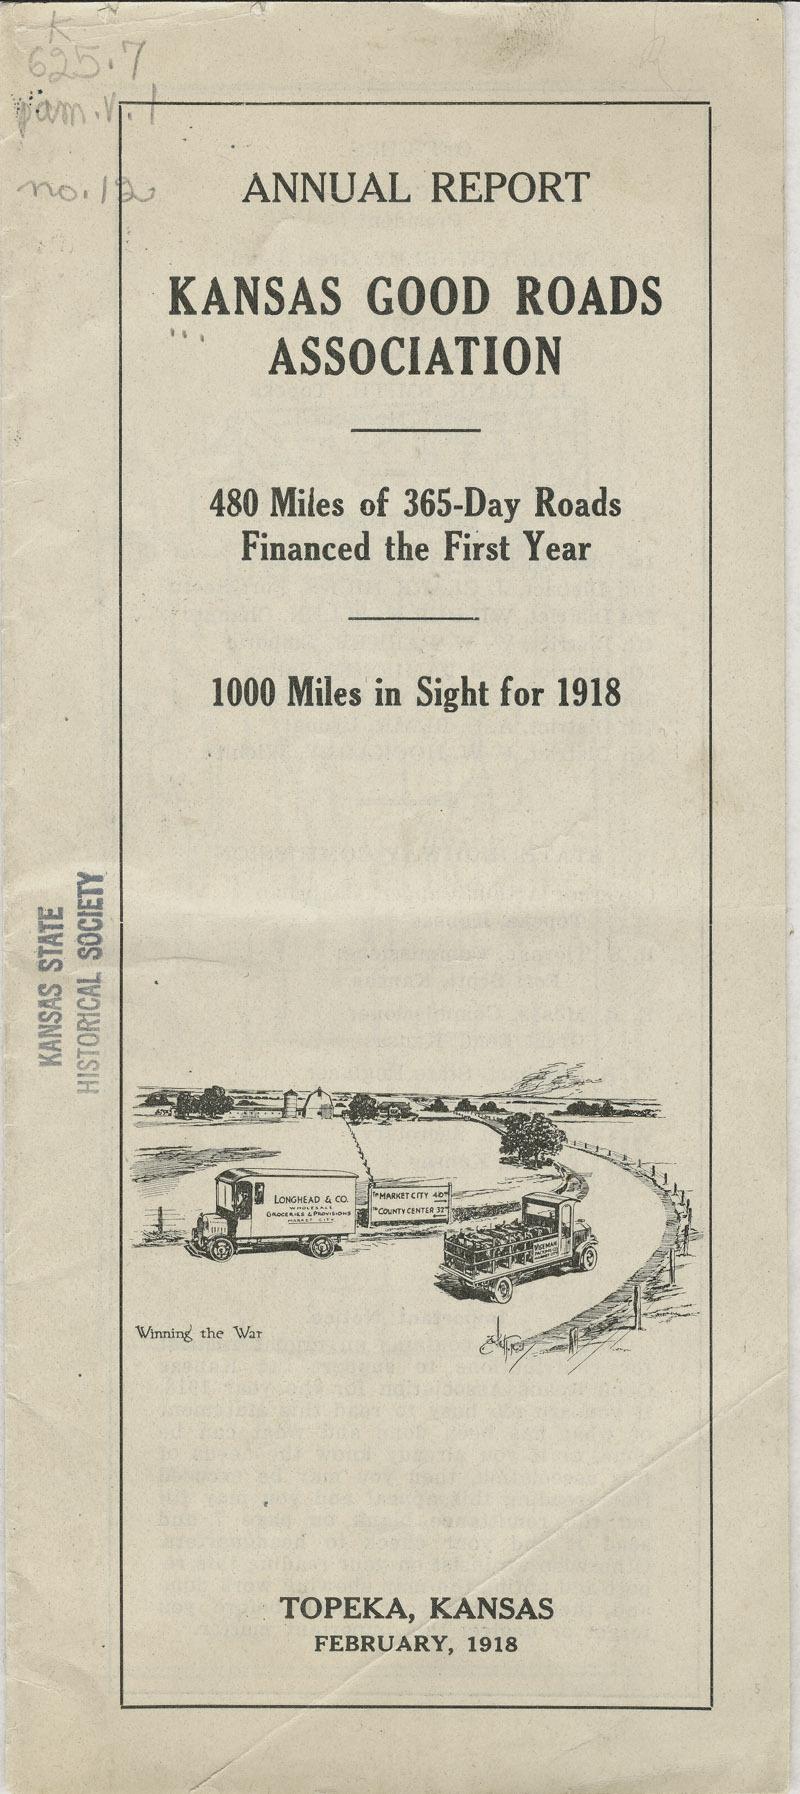 Annual report : Kansas Good Roads Association - pg. [1] cover